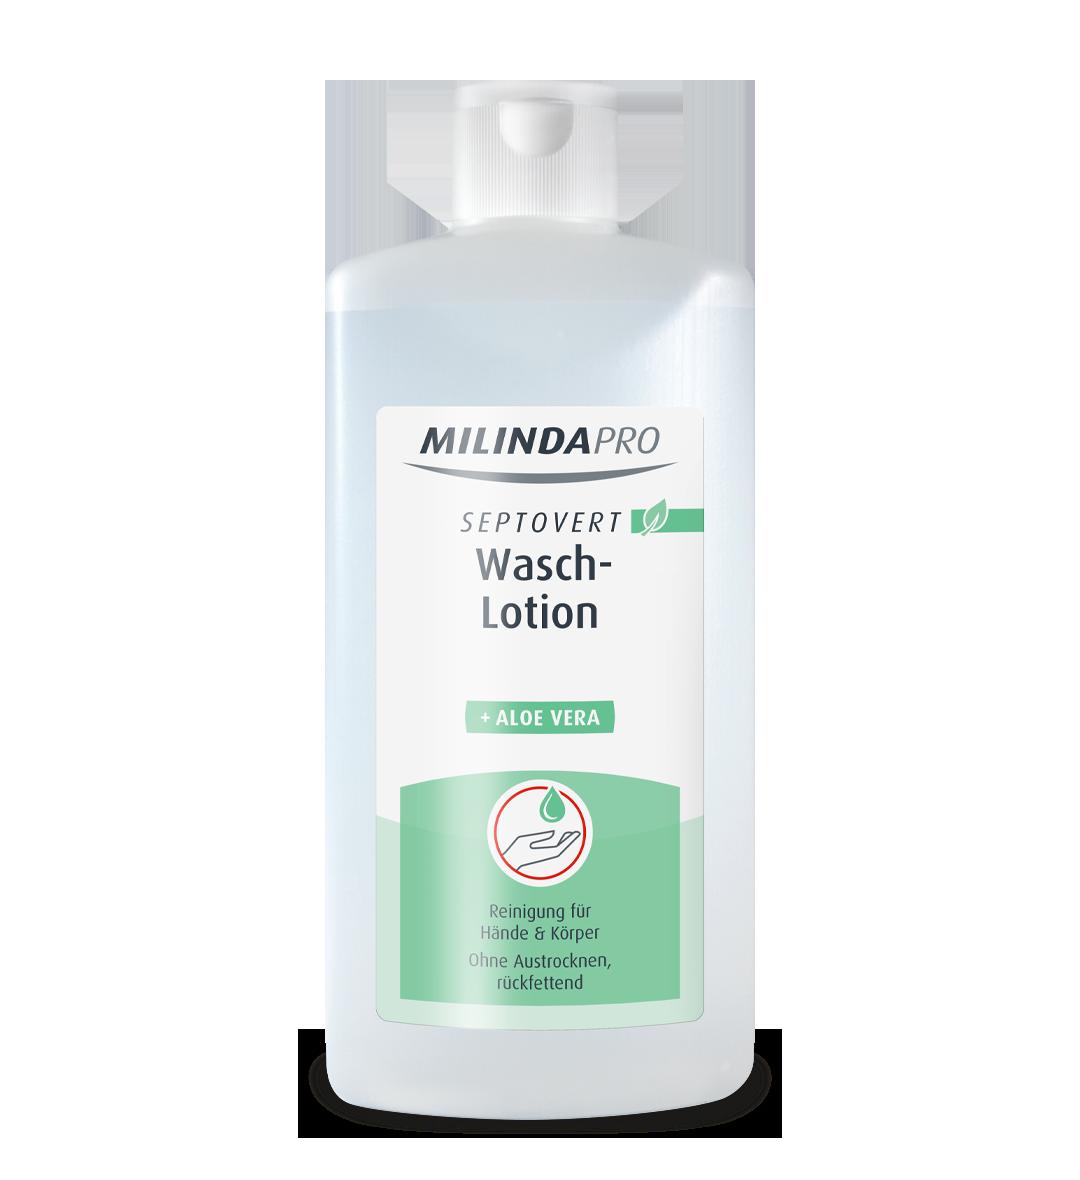 MILINDA PRO SEPTOVERT Wasch-Lotion